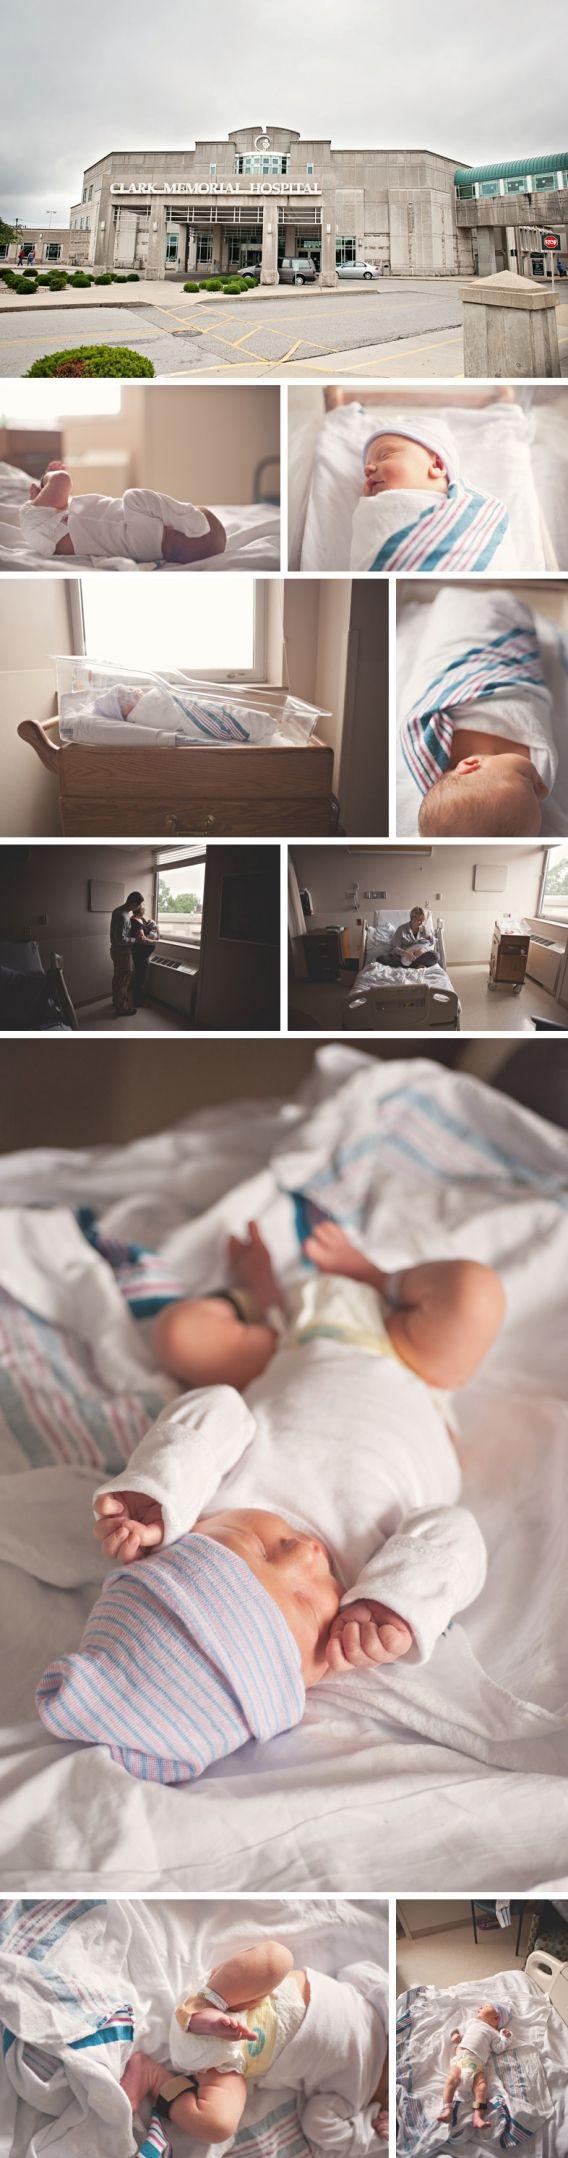 Hospital Newborn Photo Session Clark Memorial Hospital